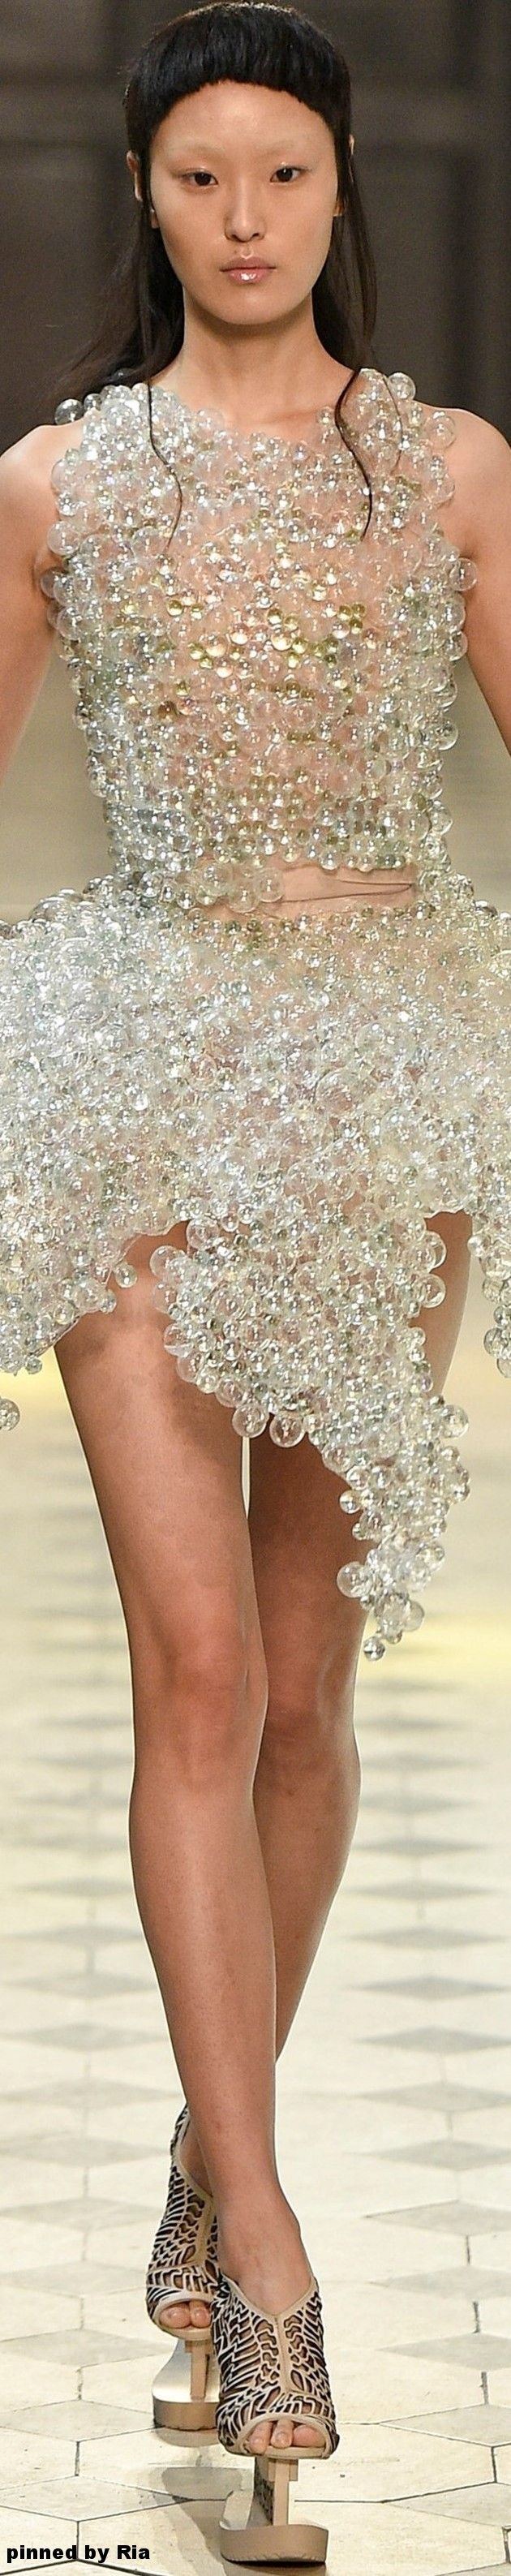 Iris van Herpen FW 2016-17 Couture l Ria